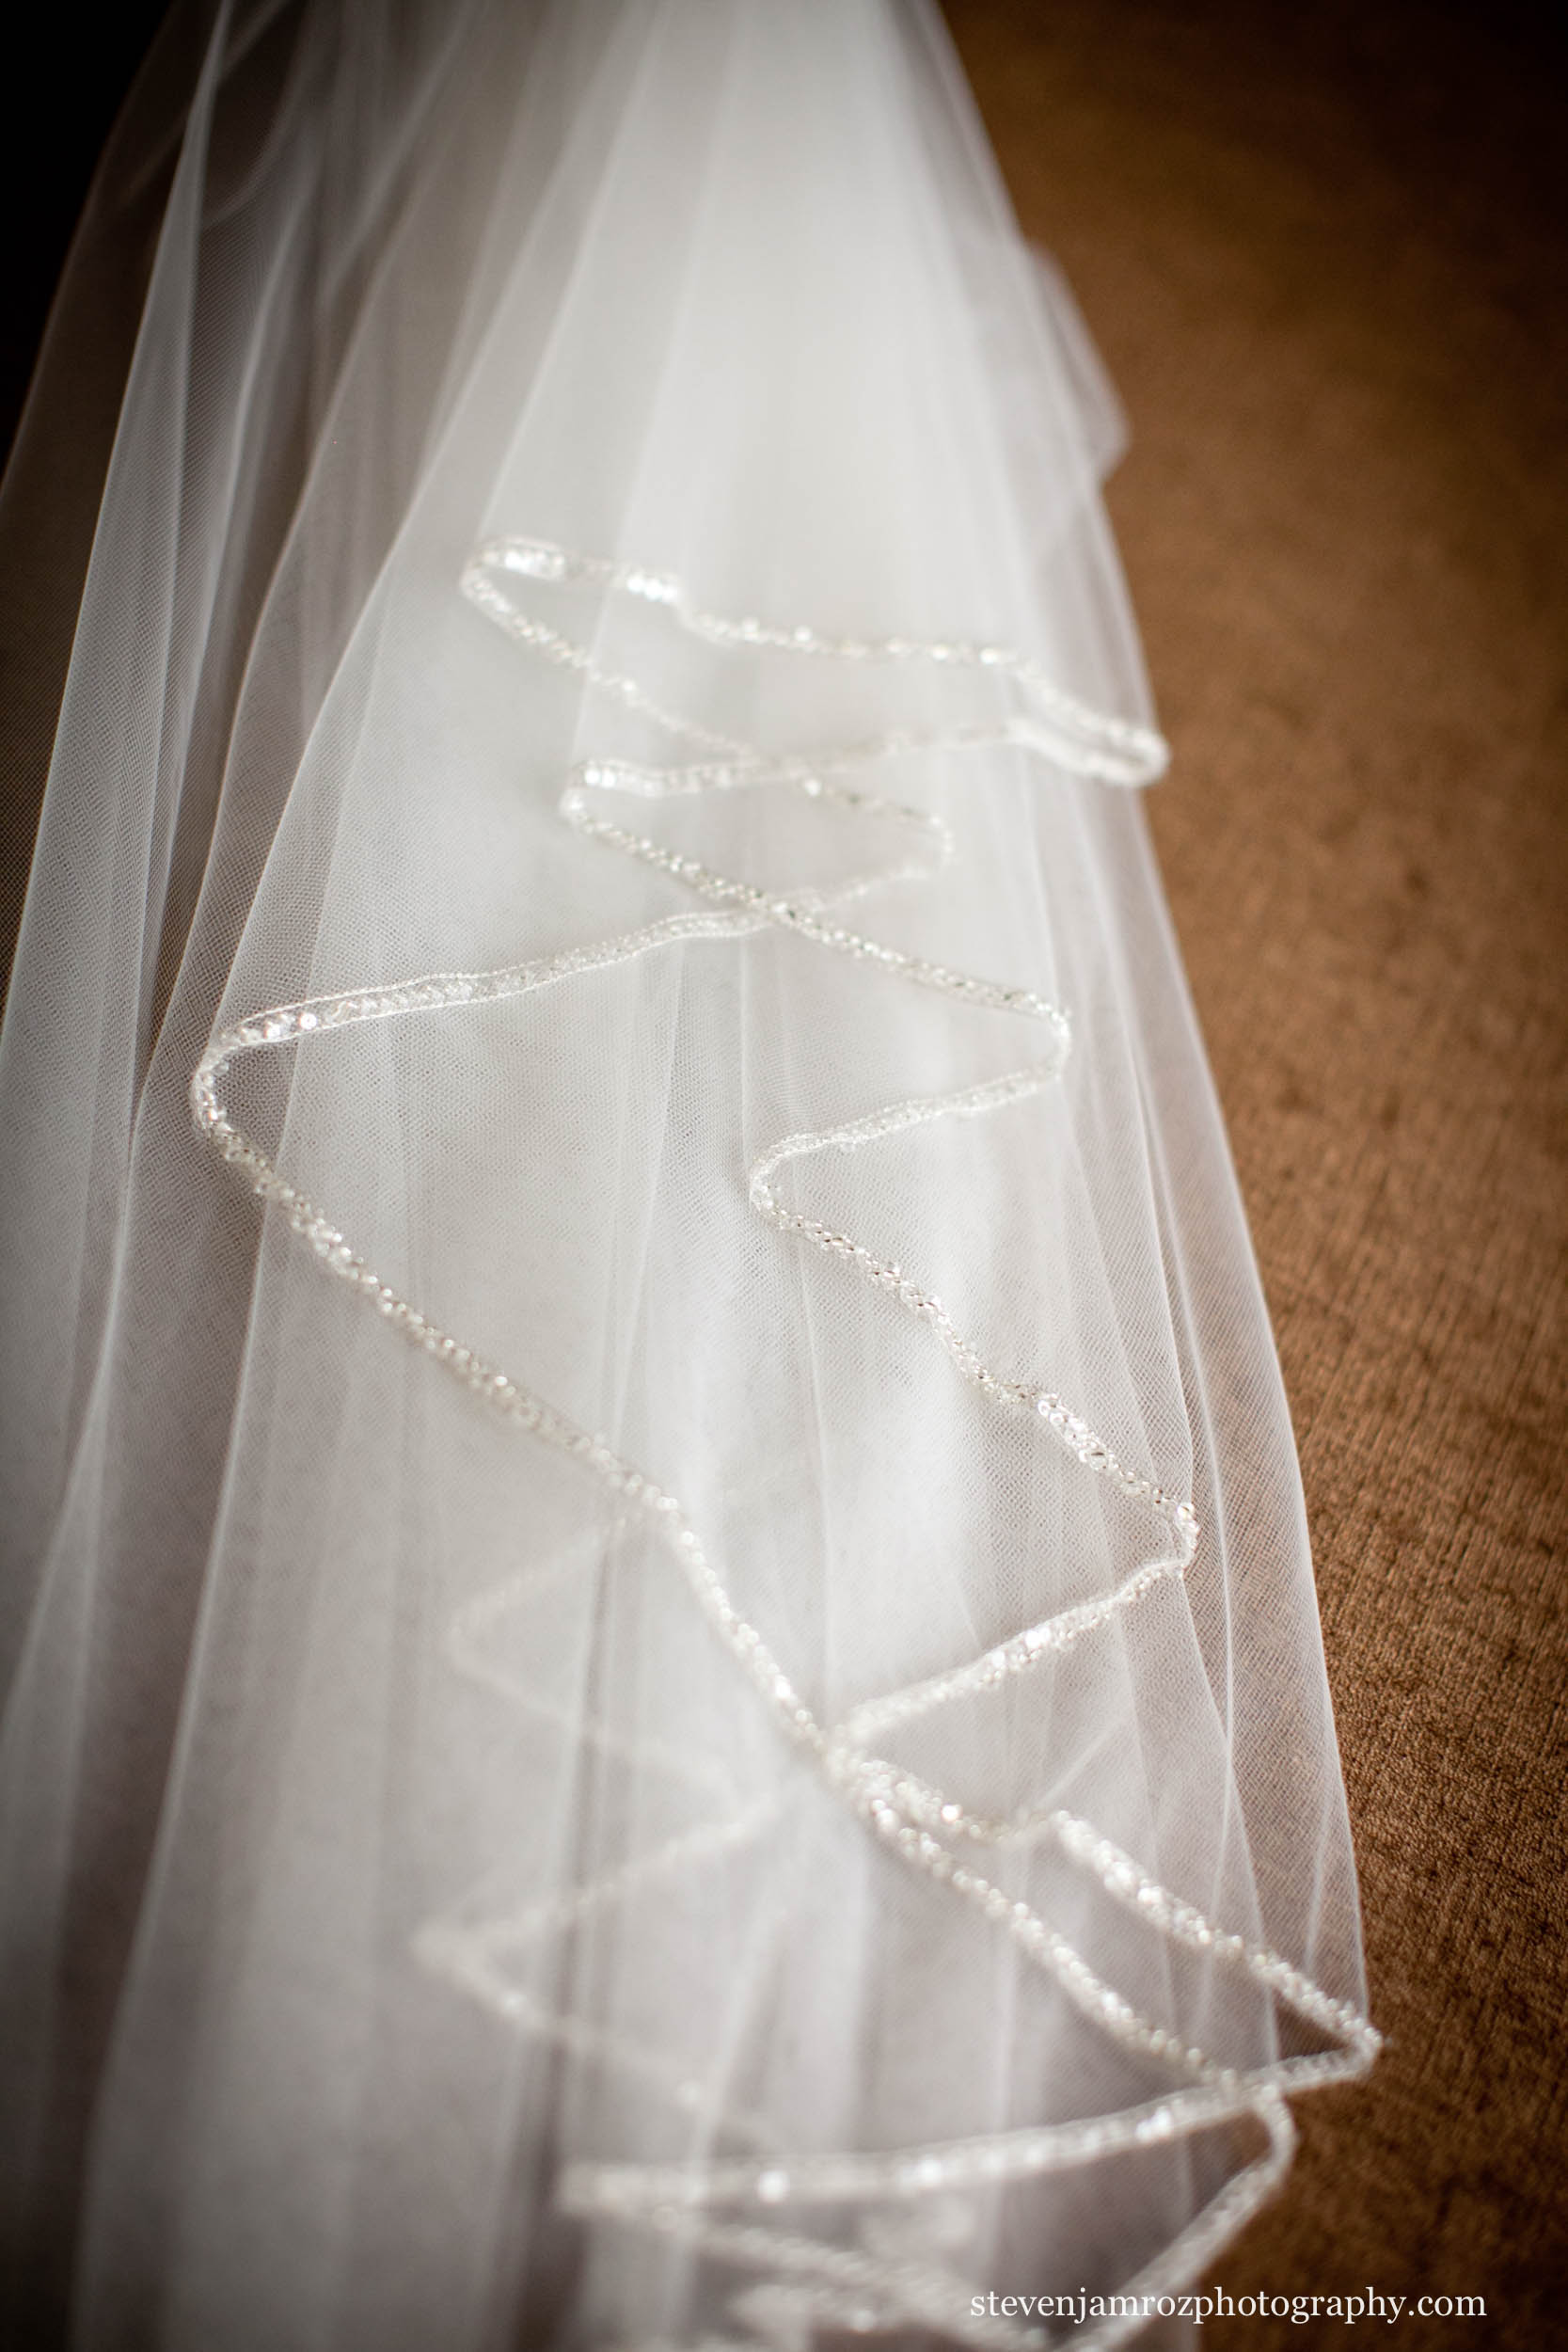 lace-veil-beautiful-wedding-nc-steven-jamroz-photography-0037.jpg